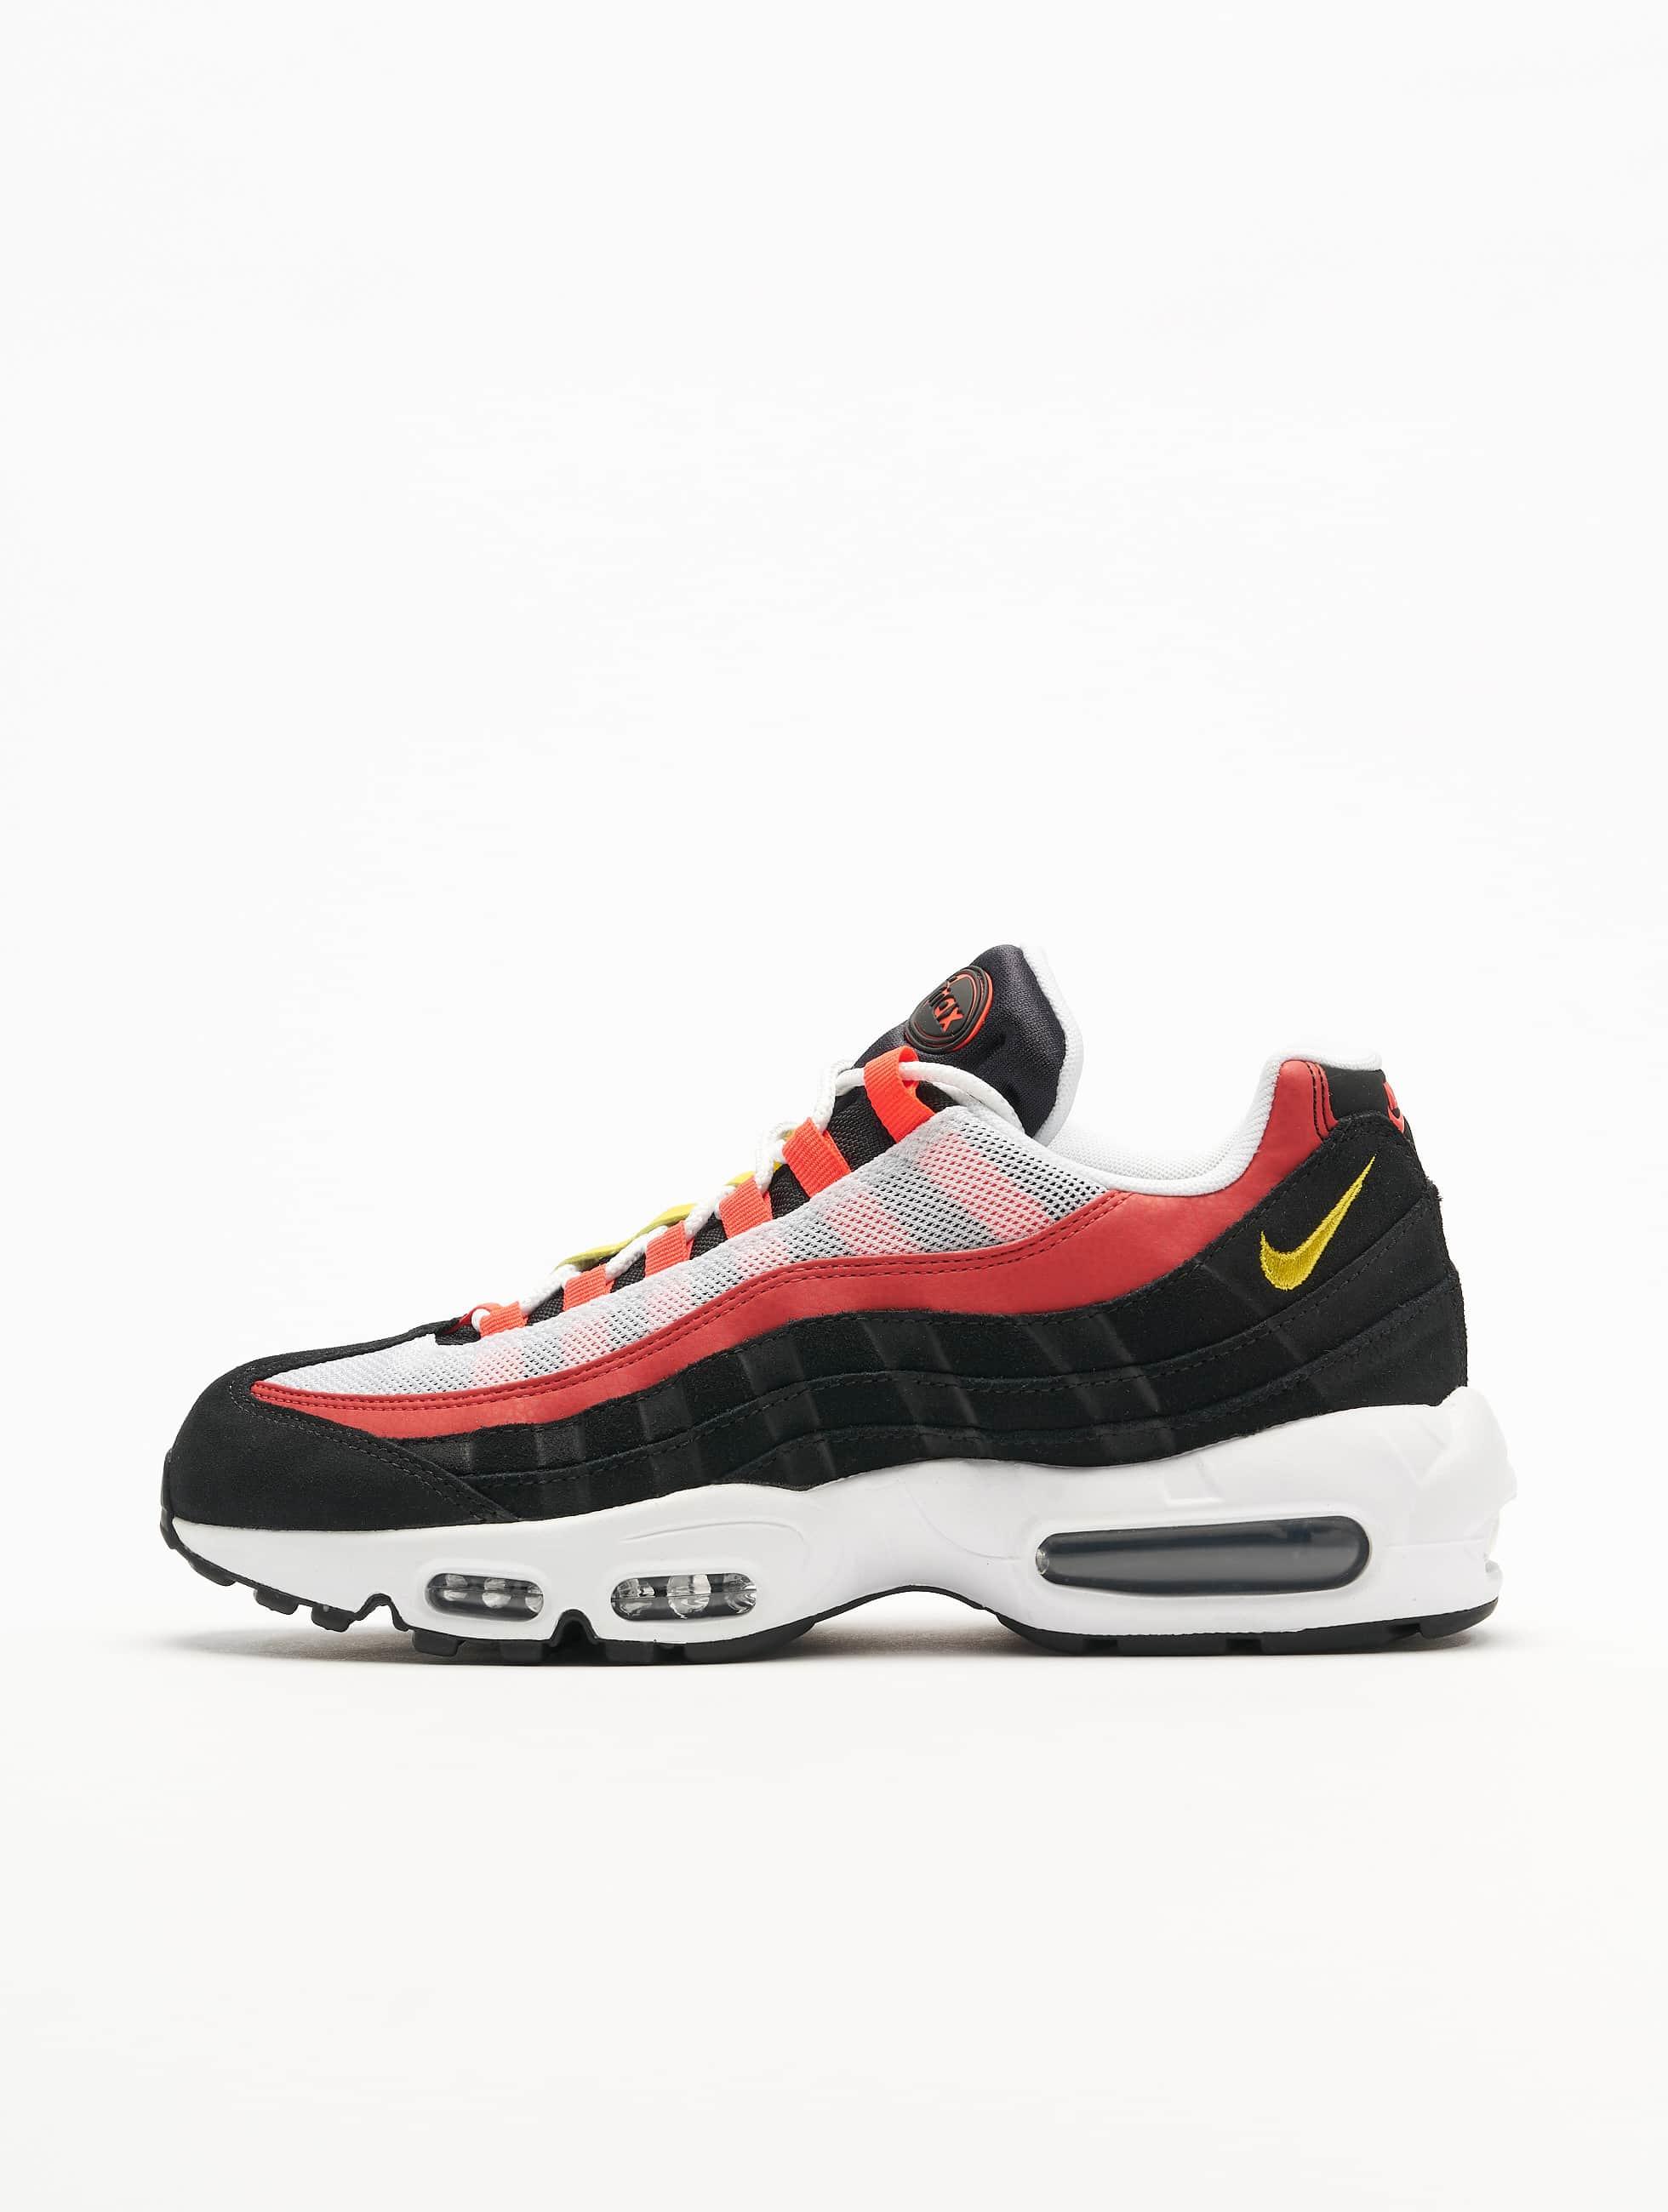 Nike Air Max 95 Essential Sneakers WhiteChrome YellowBlackBright Crimson